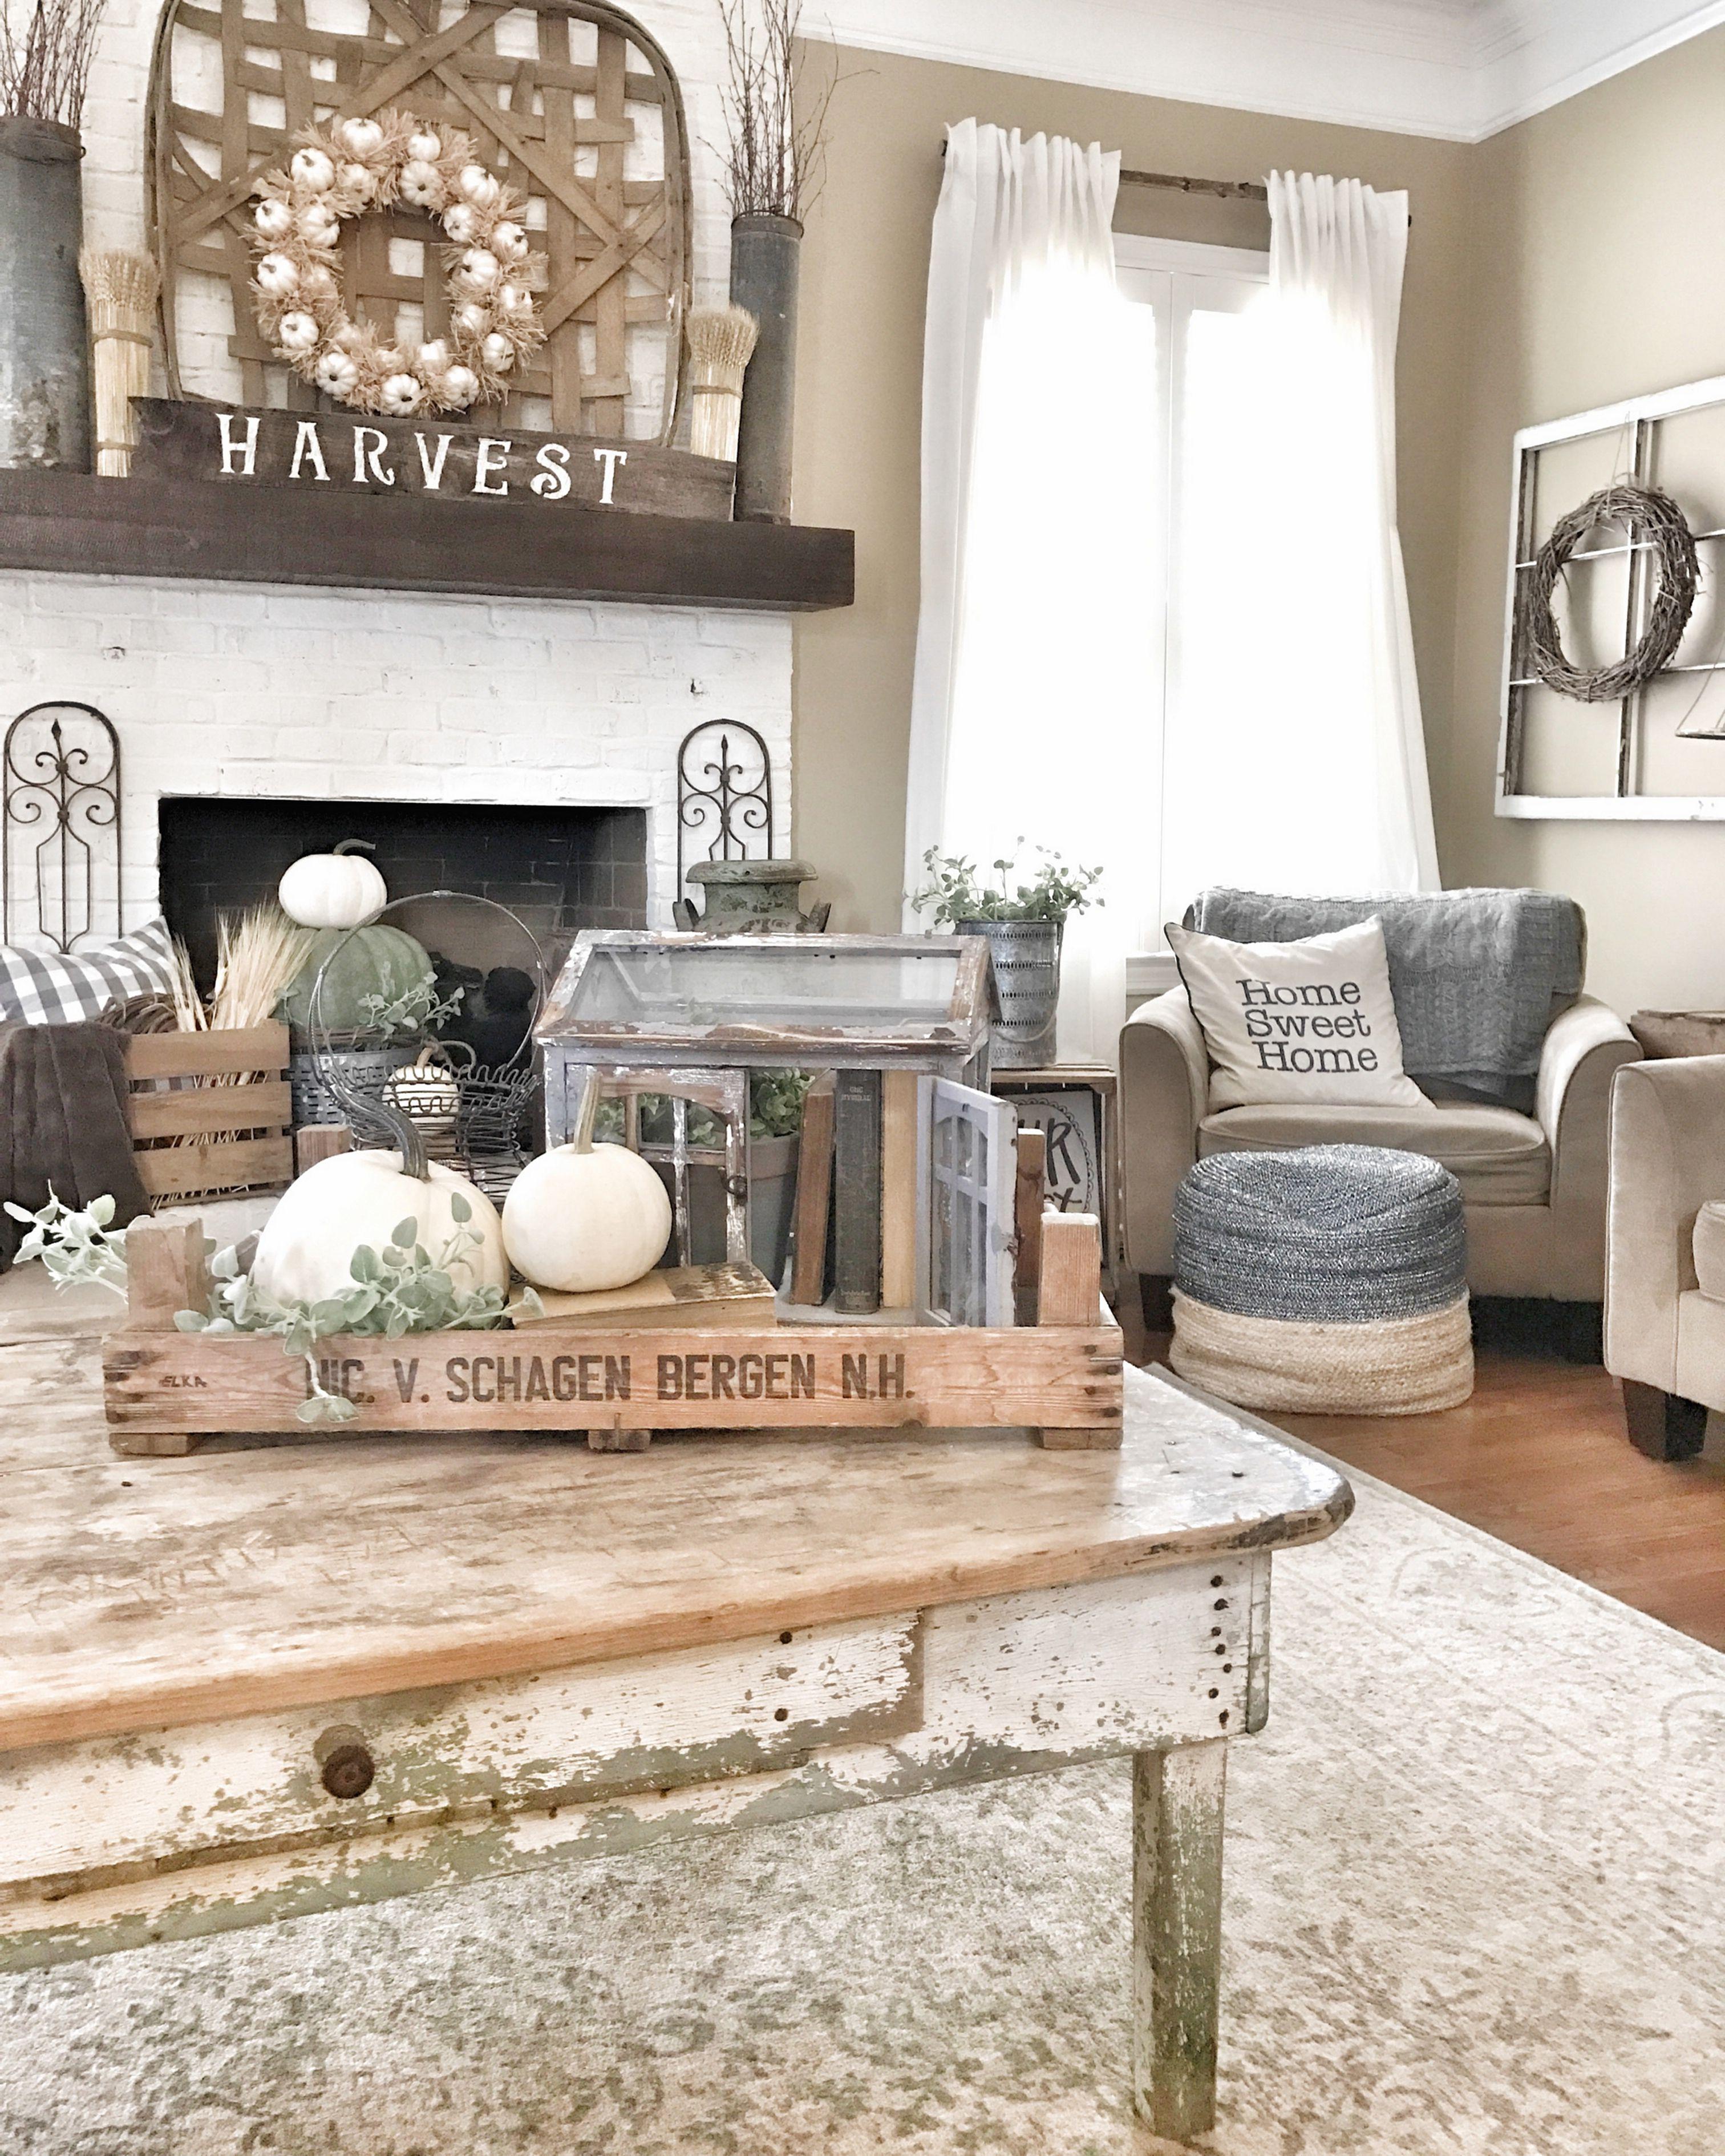 Great Idea Best Living Room Fall Decorations Ideas 75 Best Inspirations Http G Living Room Decor Rustic Farm House Living Room Rustic Farmhouse Living Room